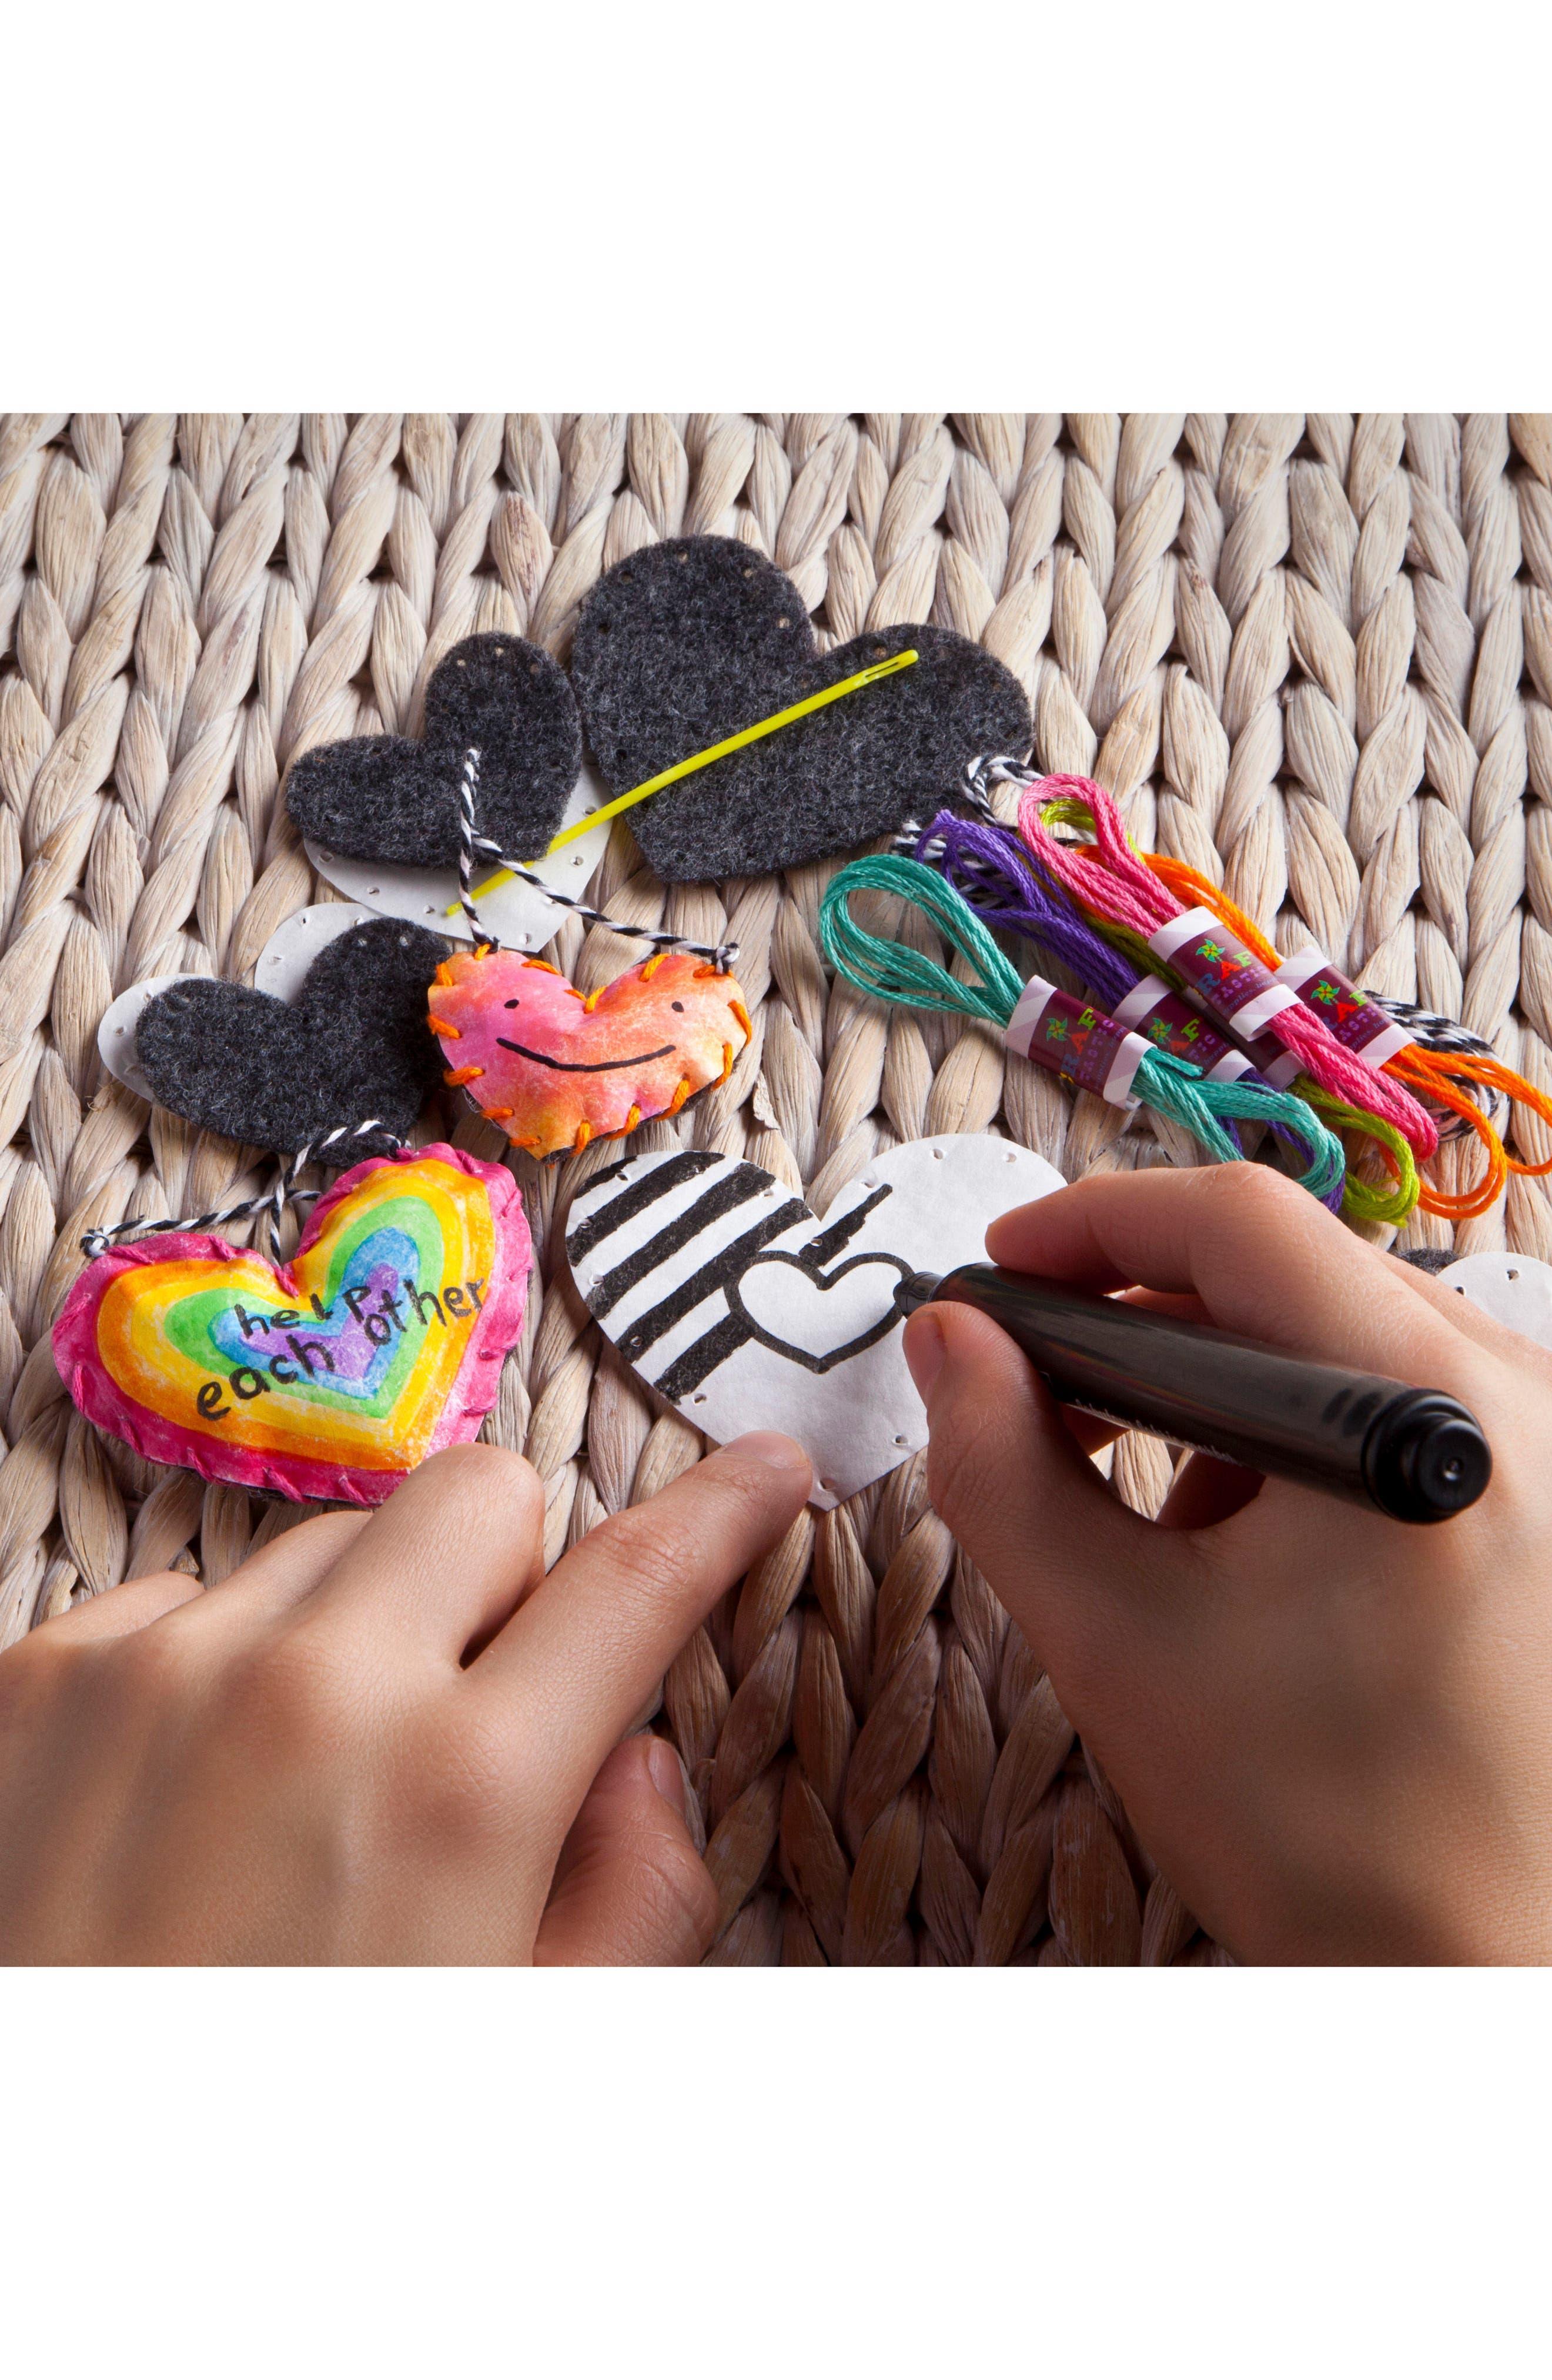 Make & Give Giving Hearts Craft Kit,                             Alternate thumbnail 2, color,                             100